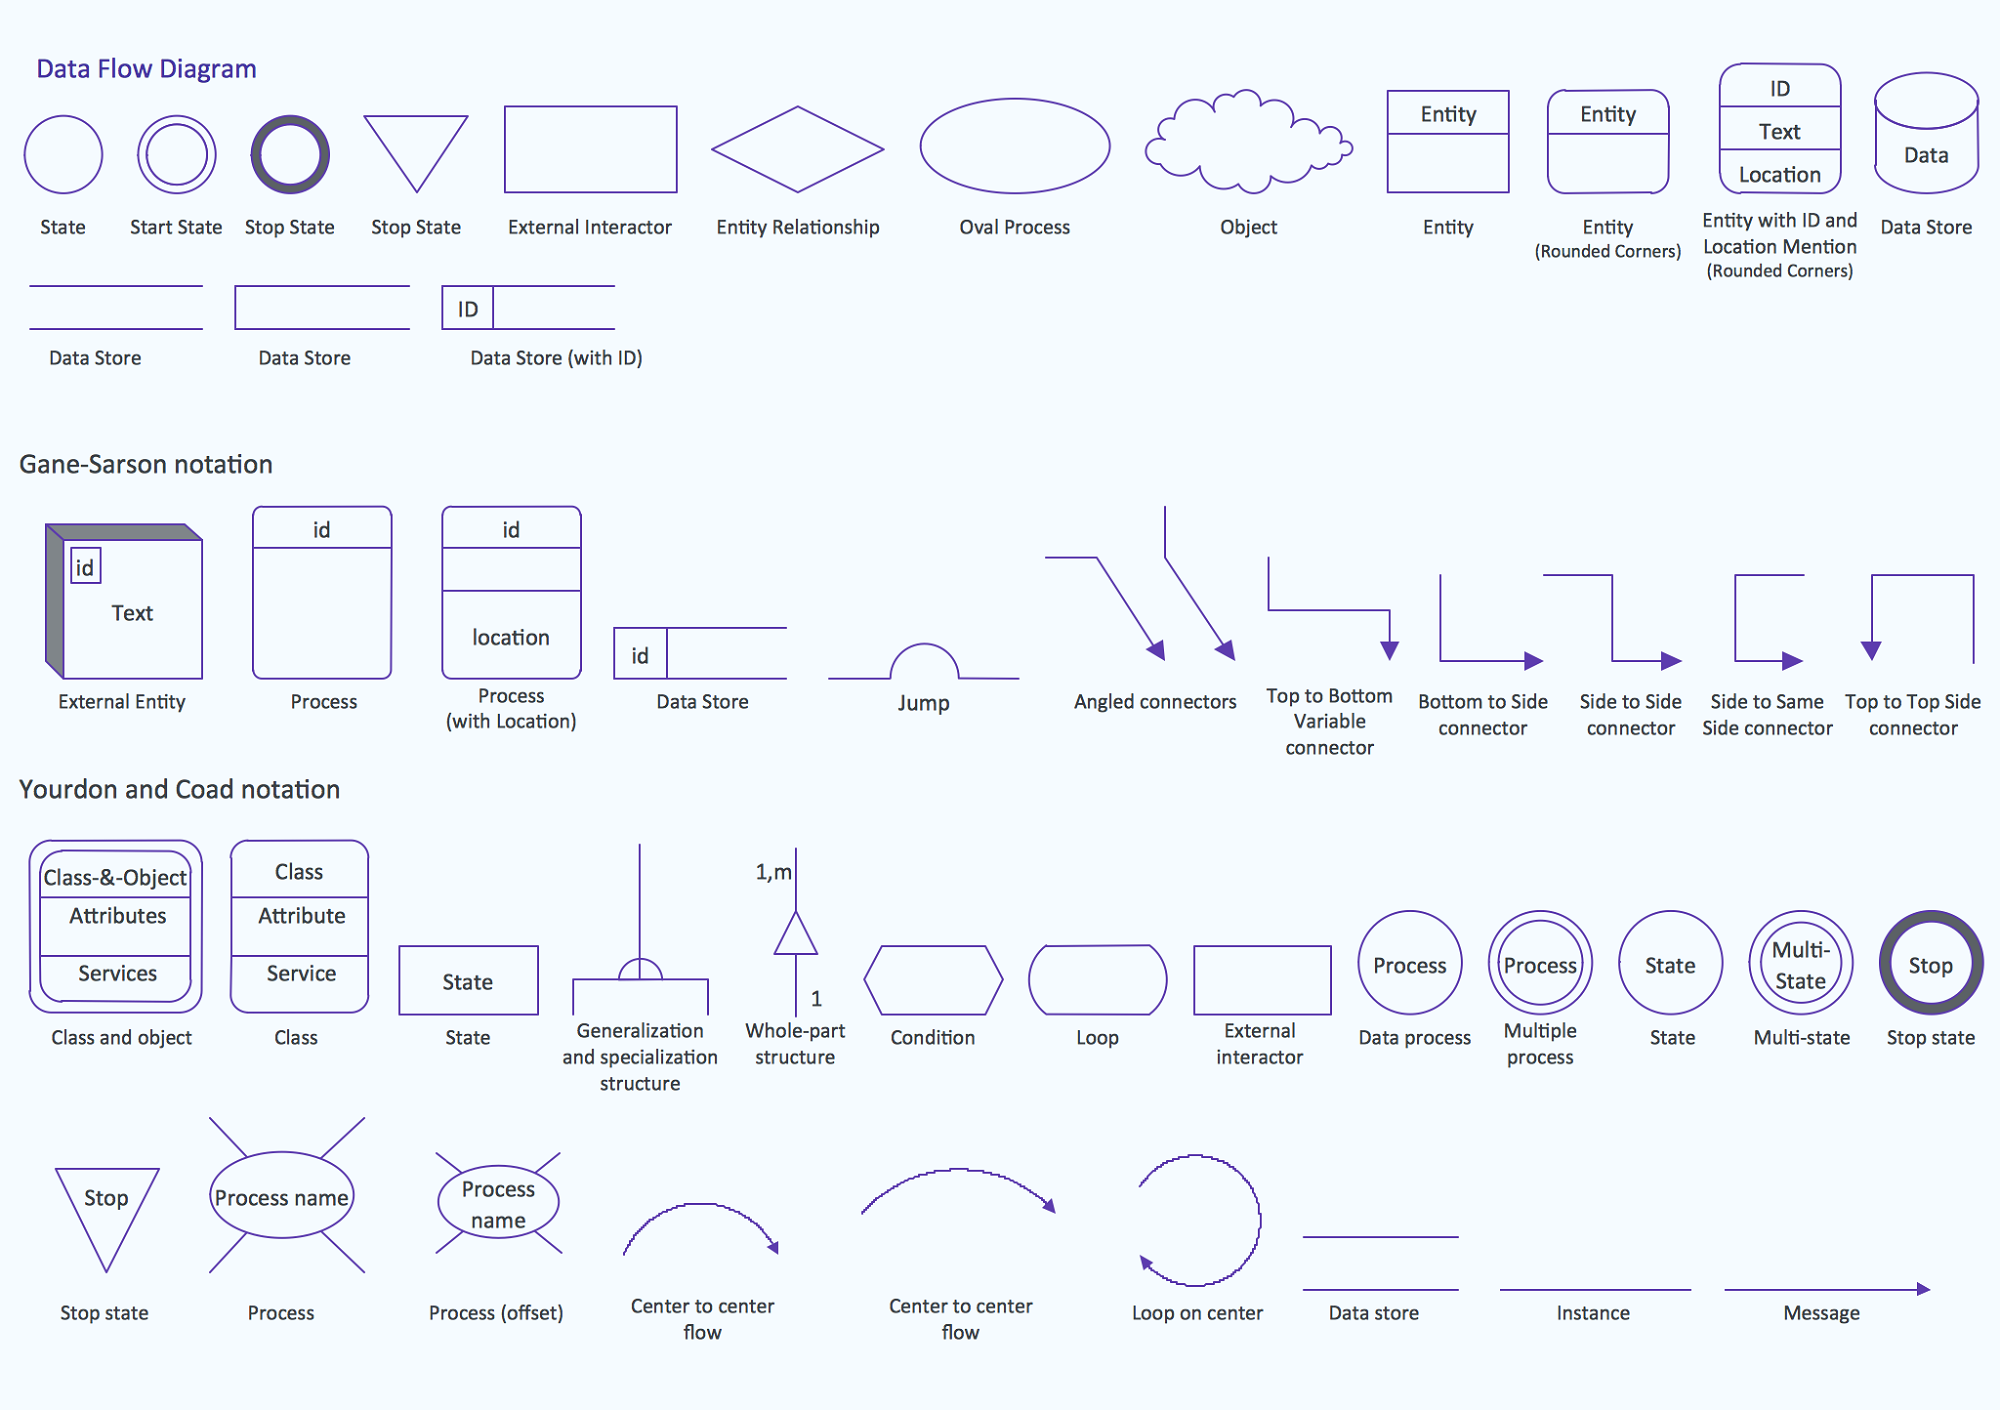 Data Flow Diagram Visio Shapes